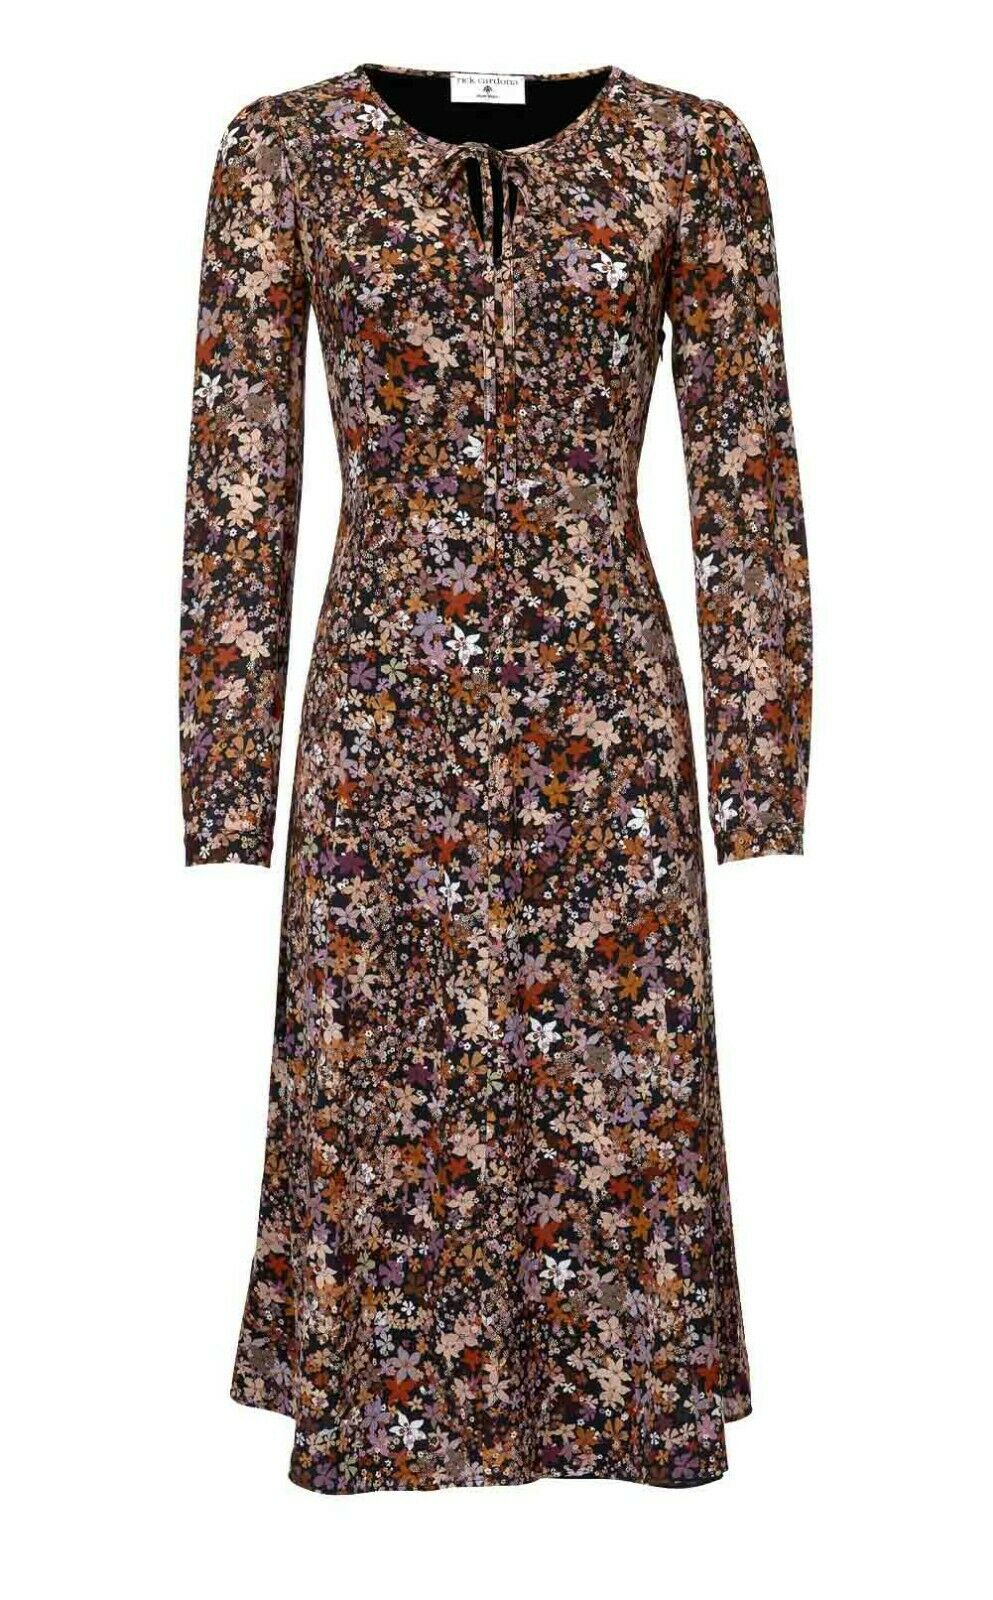 TCJ Rick Cardona Sexy Kleid Designerkleid Blaumen Blüten bunt Sommerkleid 40-46